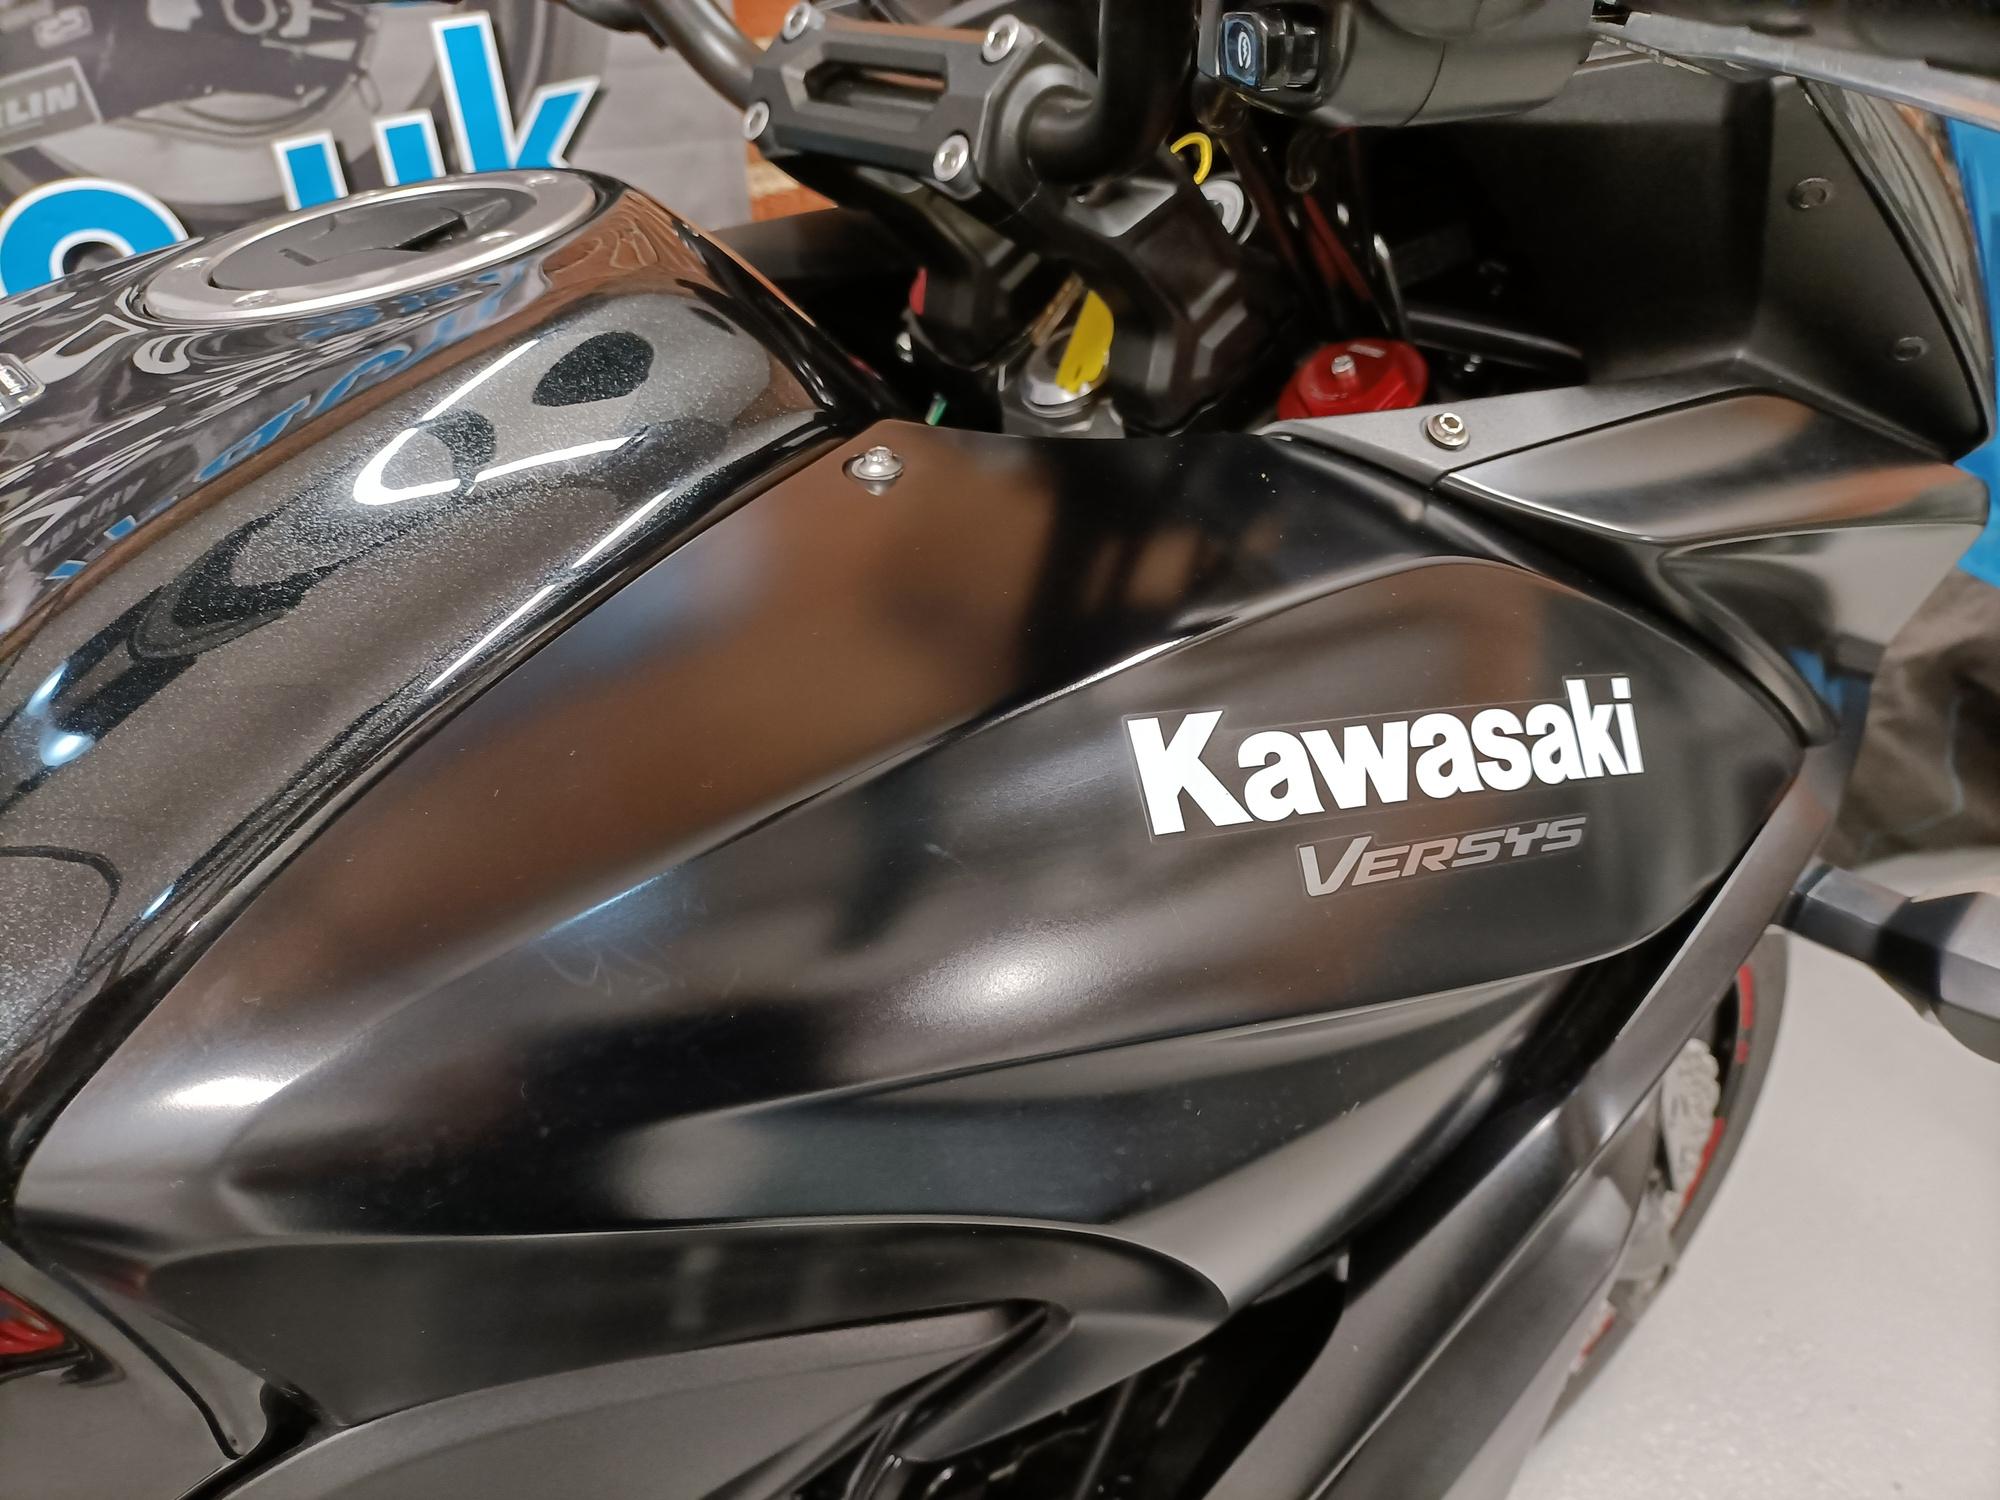 KAWASAKI KLE 650 VERSYS ABS FULL LUGGAGE ECONOMICAL TOURER